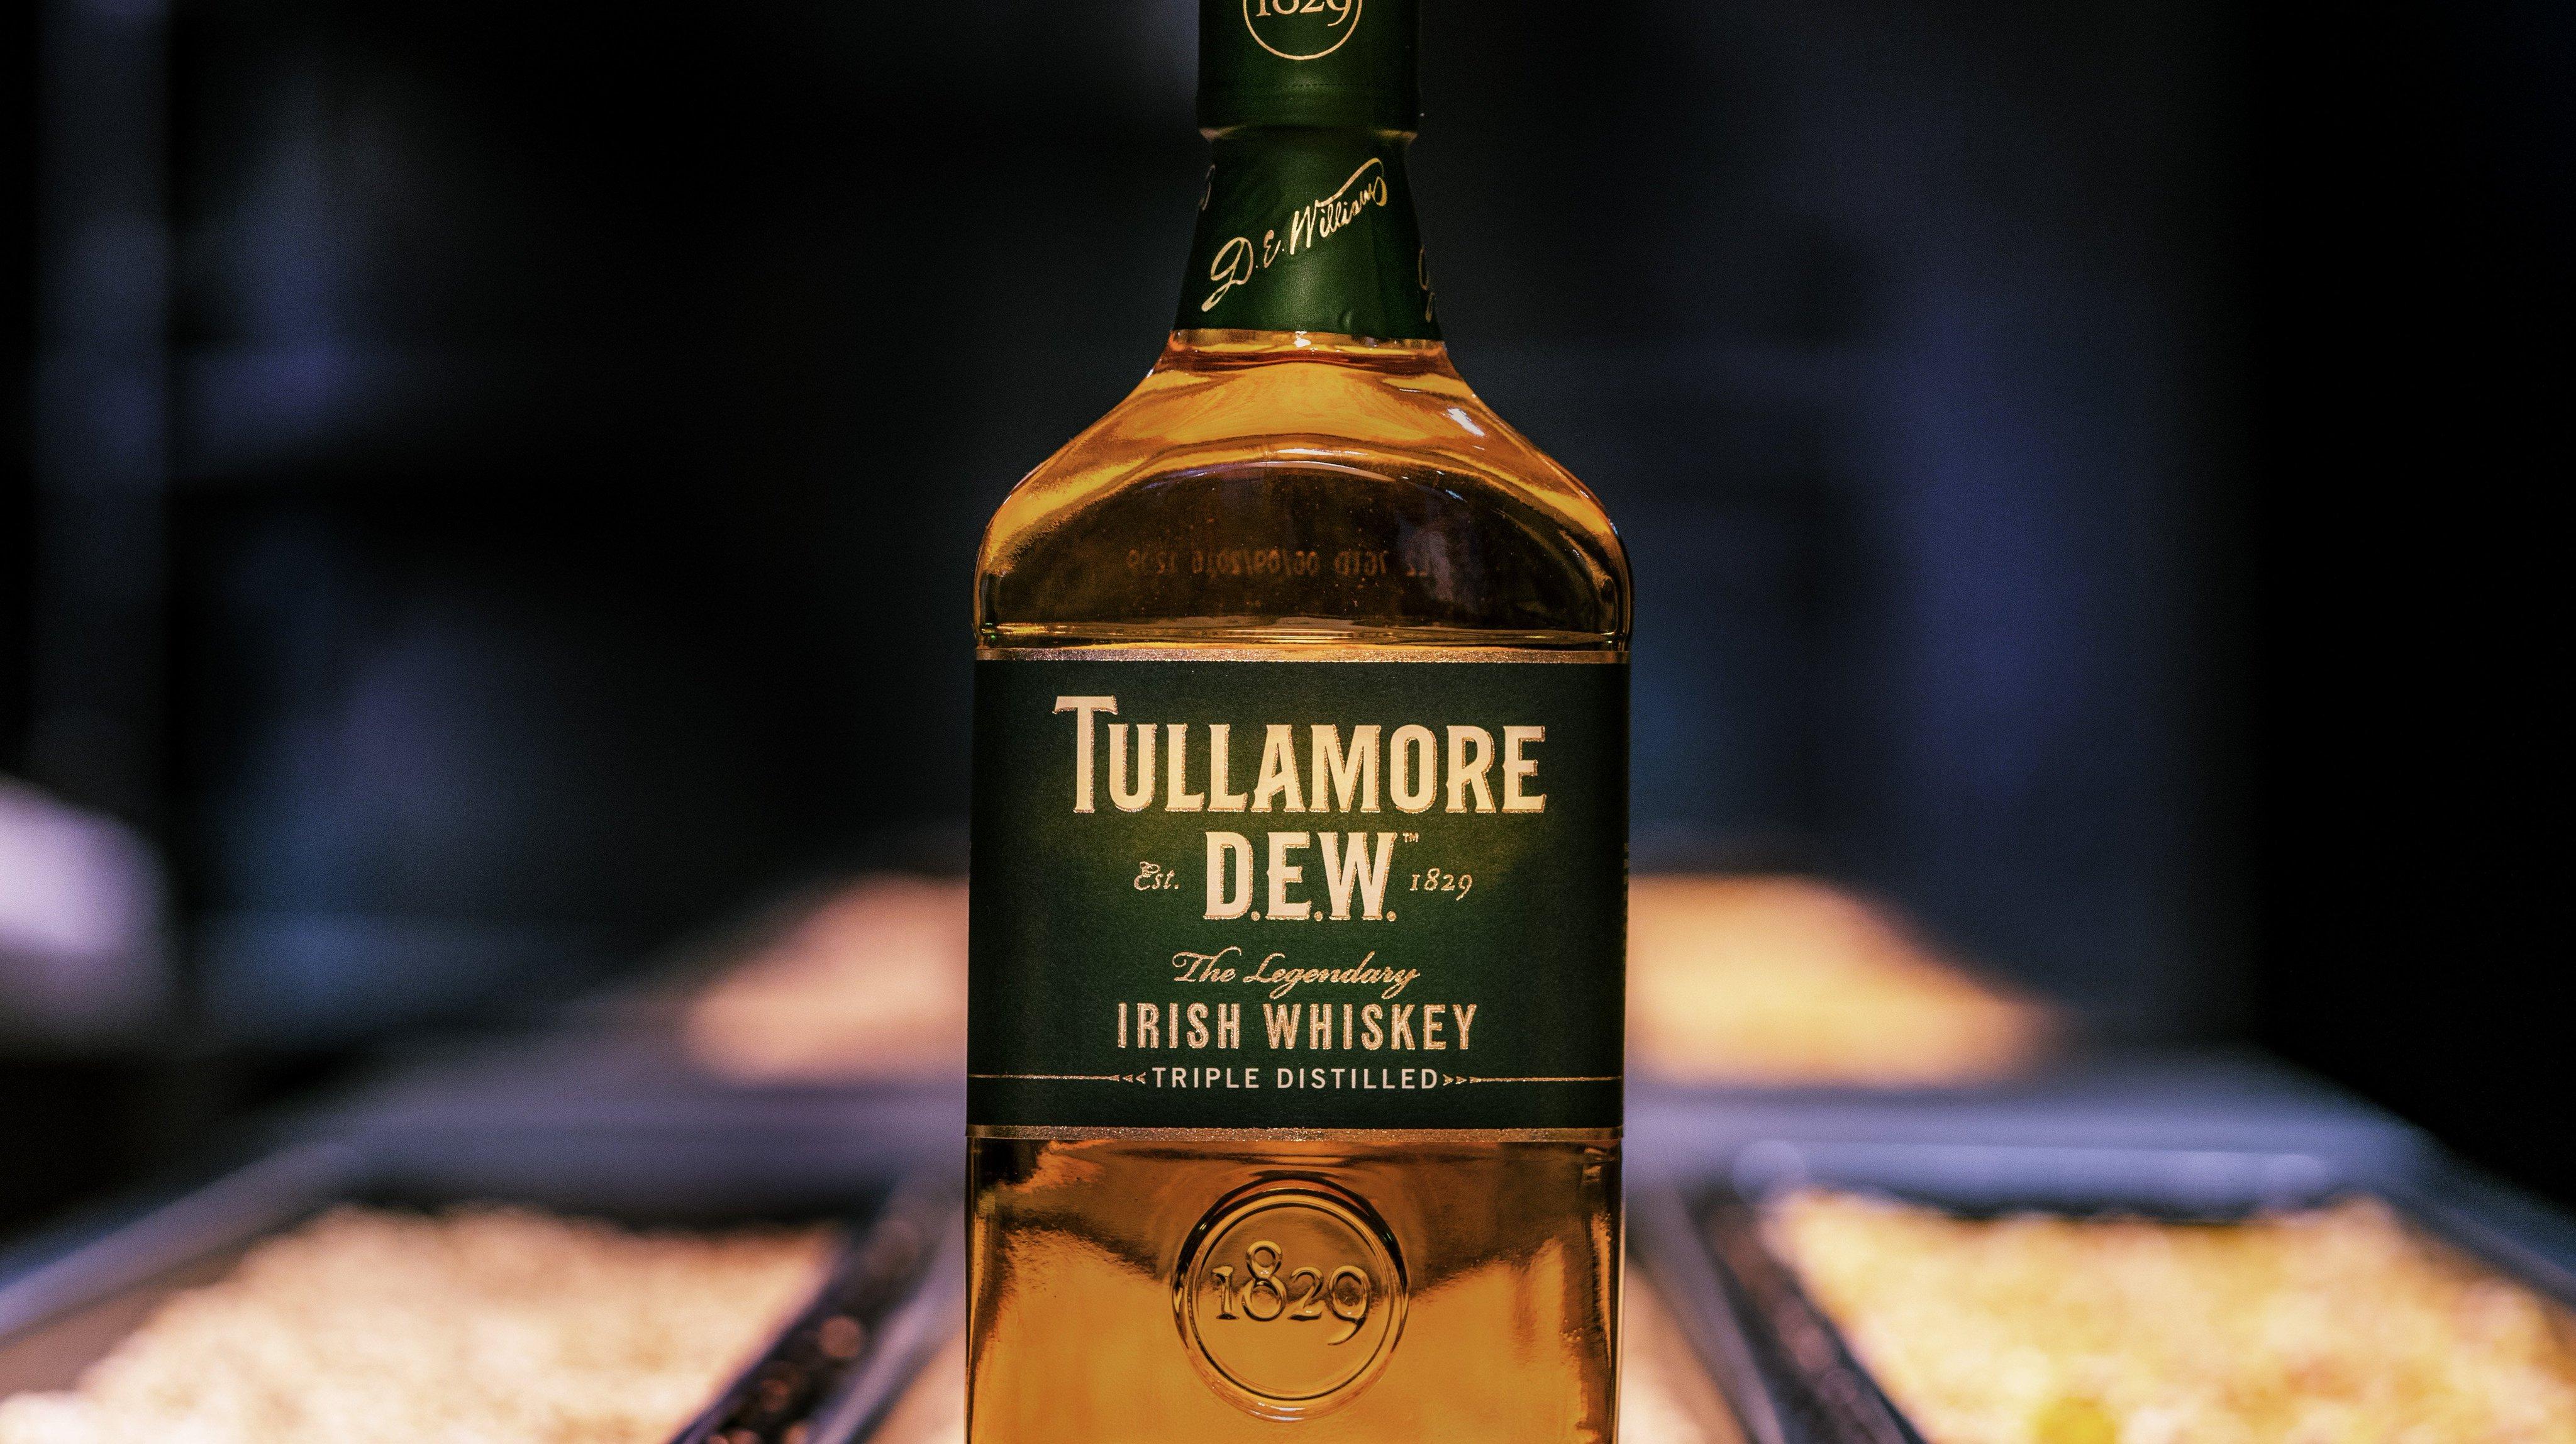 Tullamore 1